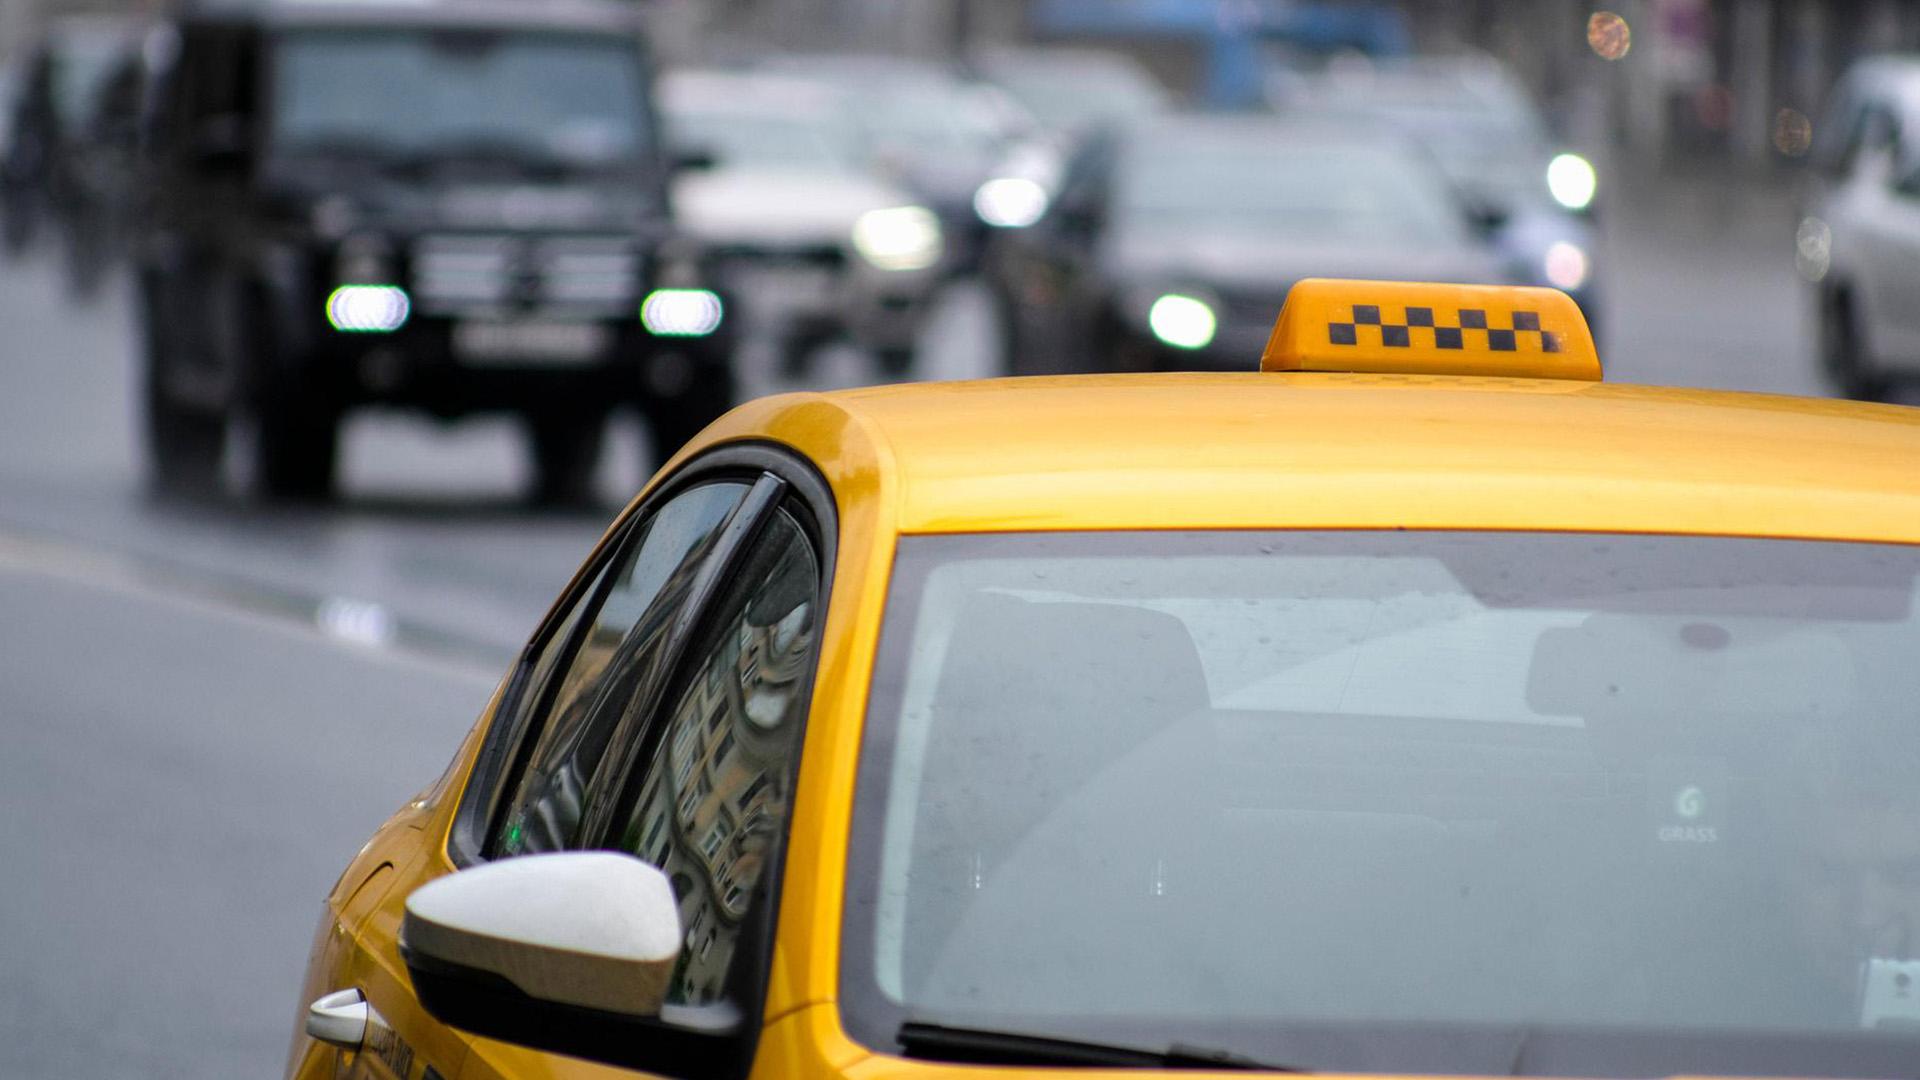 В итоговом отчете ГИБДД за 2020 год отмечено снижение аварийности с участием такси